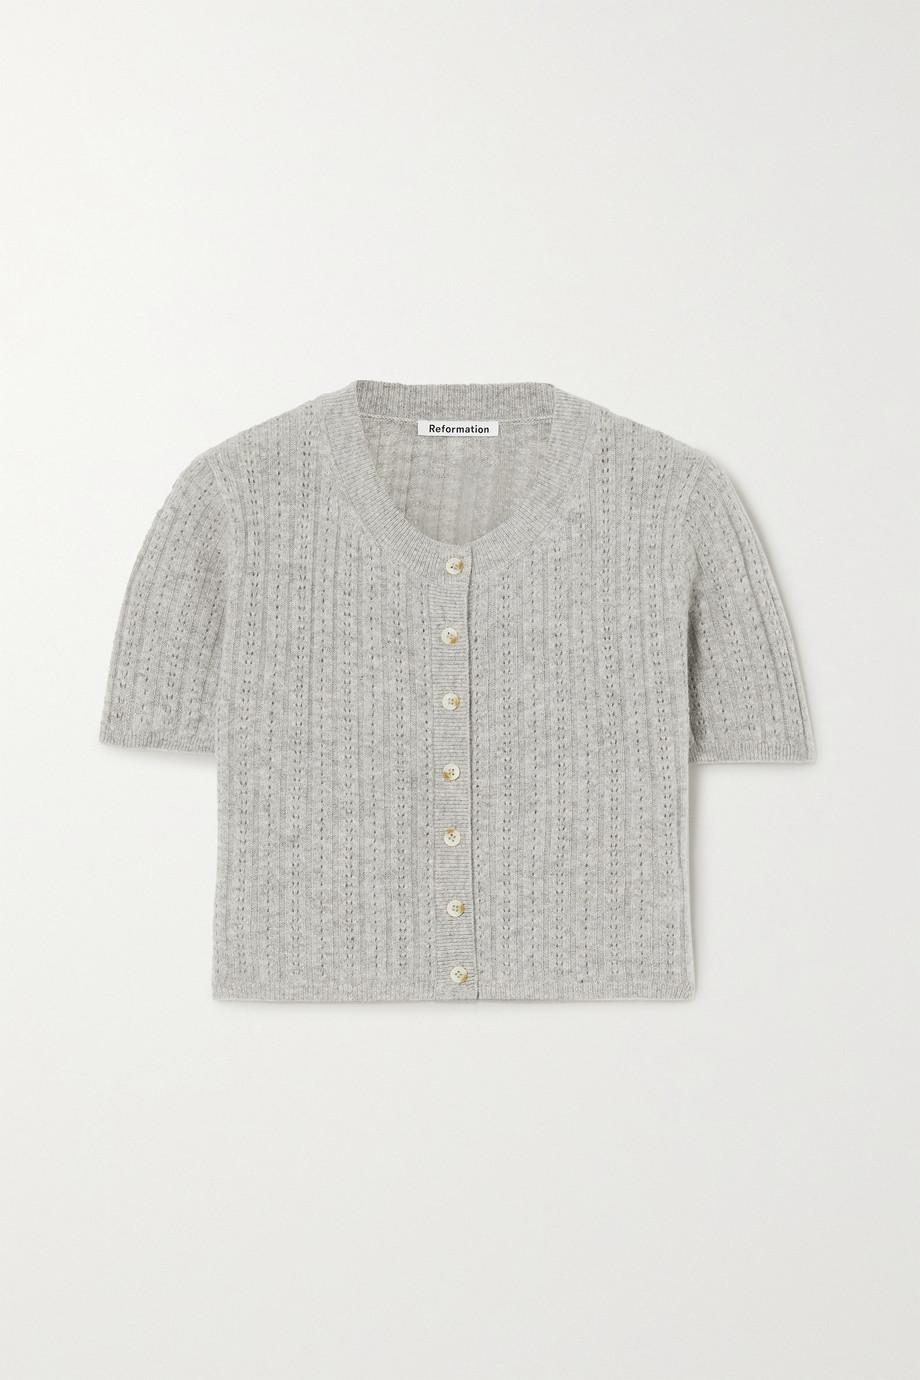 Reformation Germaine pointelle-knit cashmere cardigan